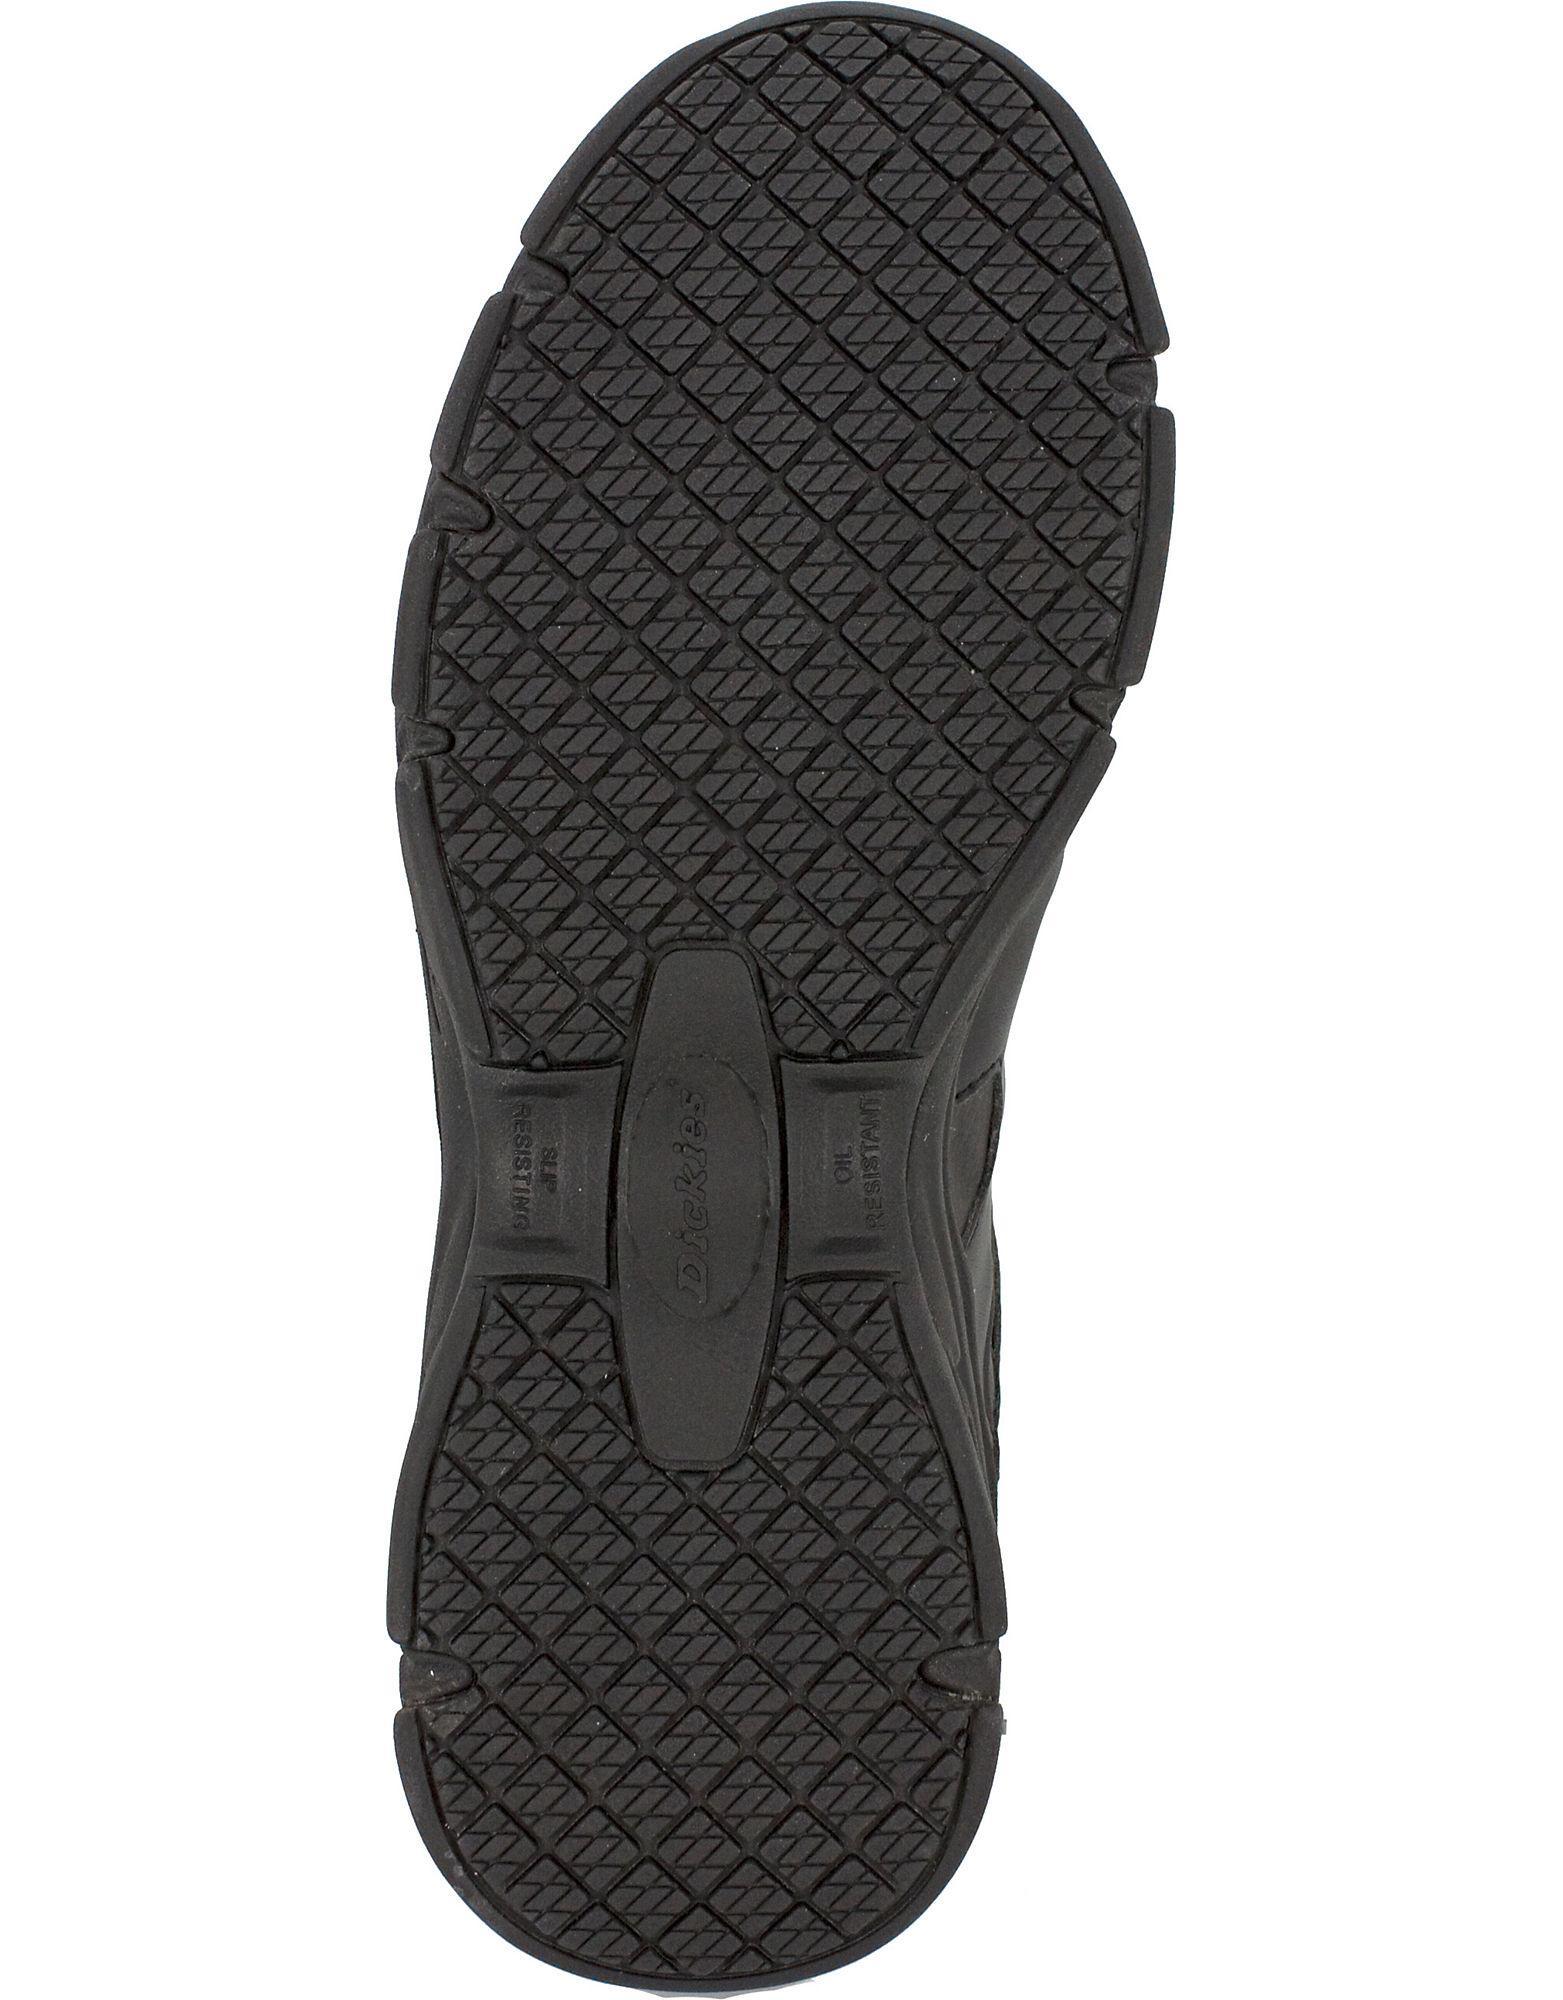 5a5d069f9c8 Women s Slip Resisting Athletic Lace Work Shoe – Legacy School ...